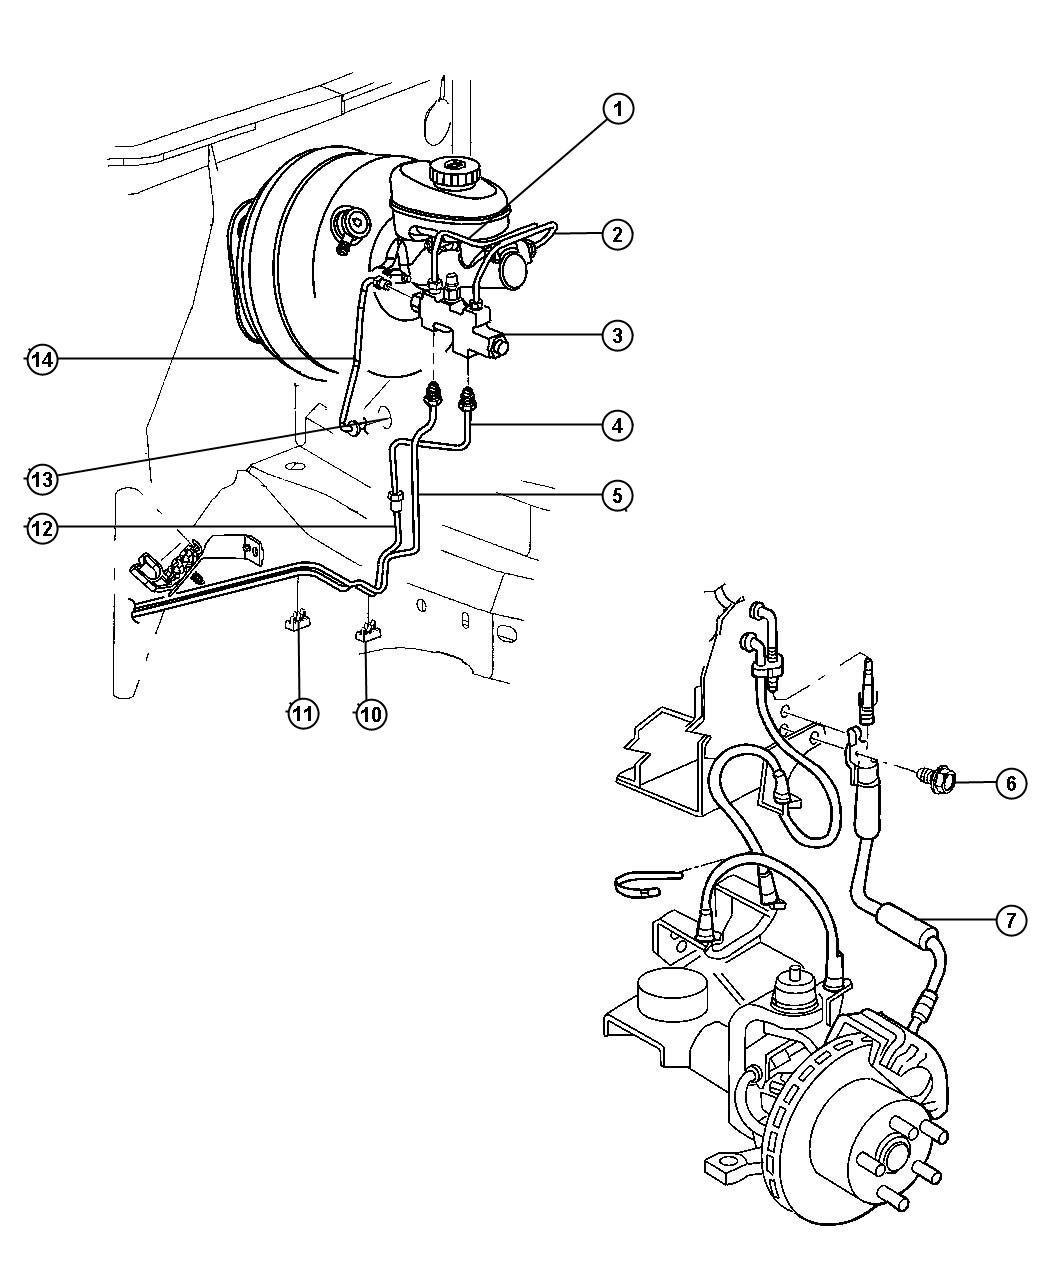 1996 Jeep Cherokee Brake Proportioning Valve Diagram